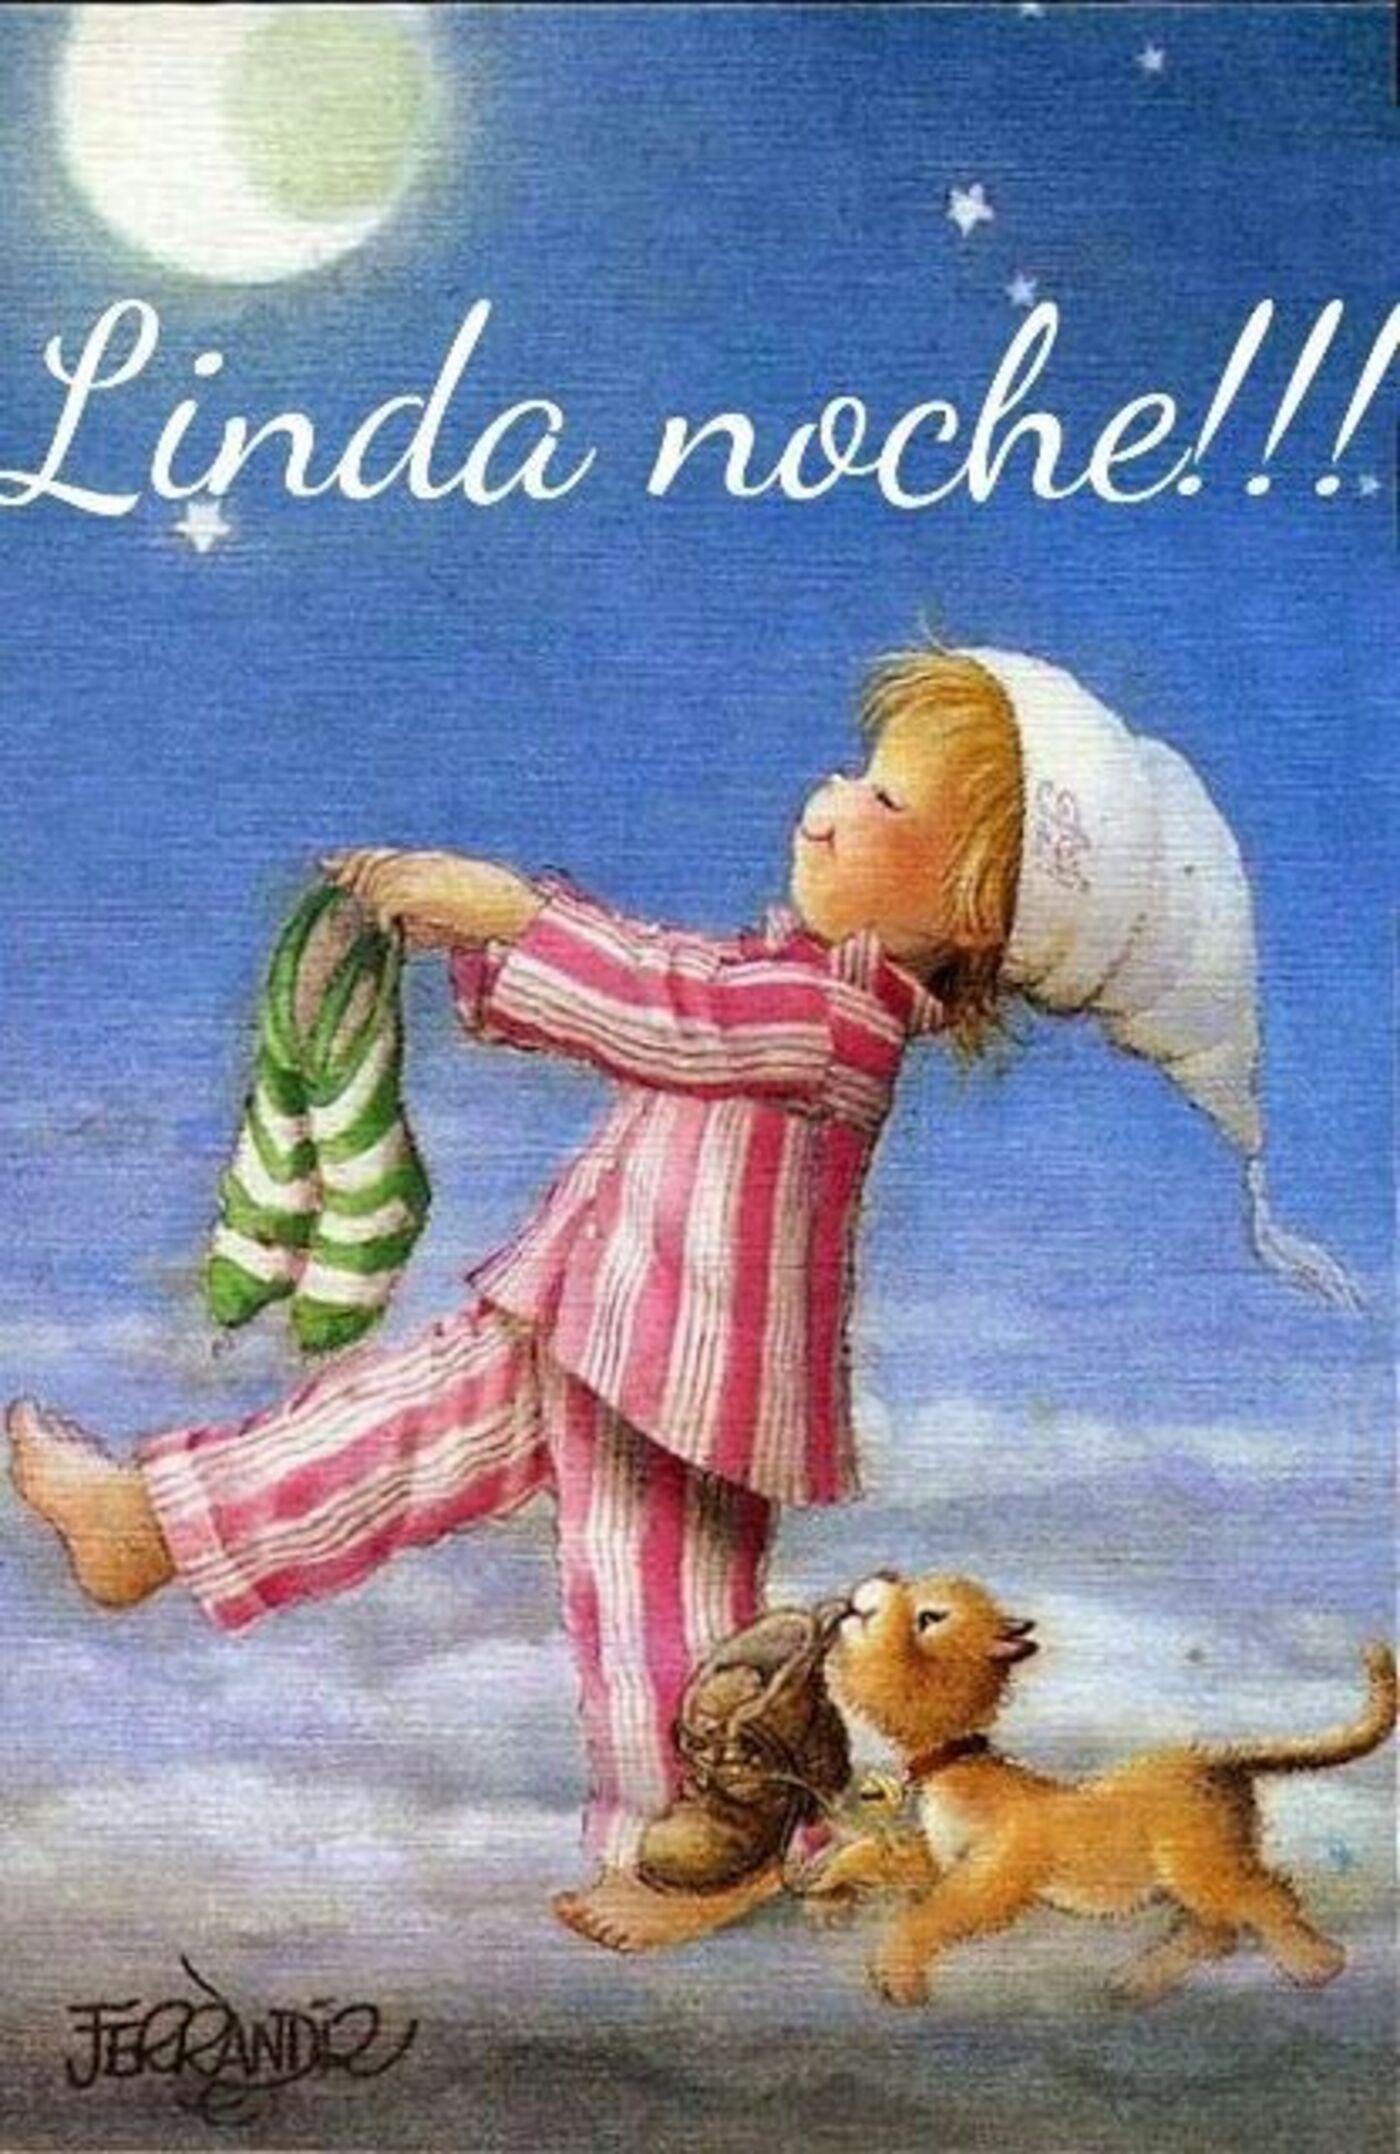 Linda noche!!